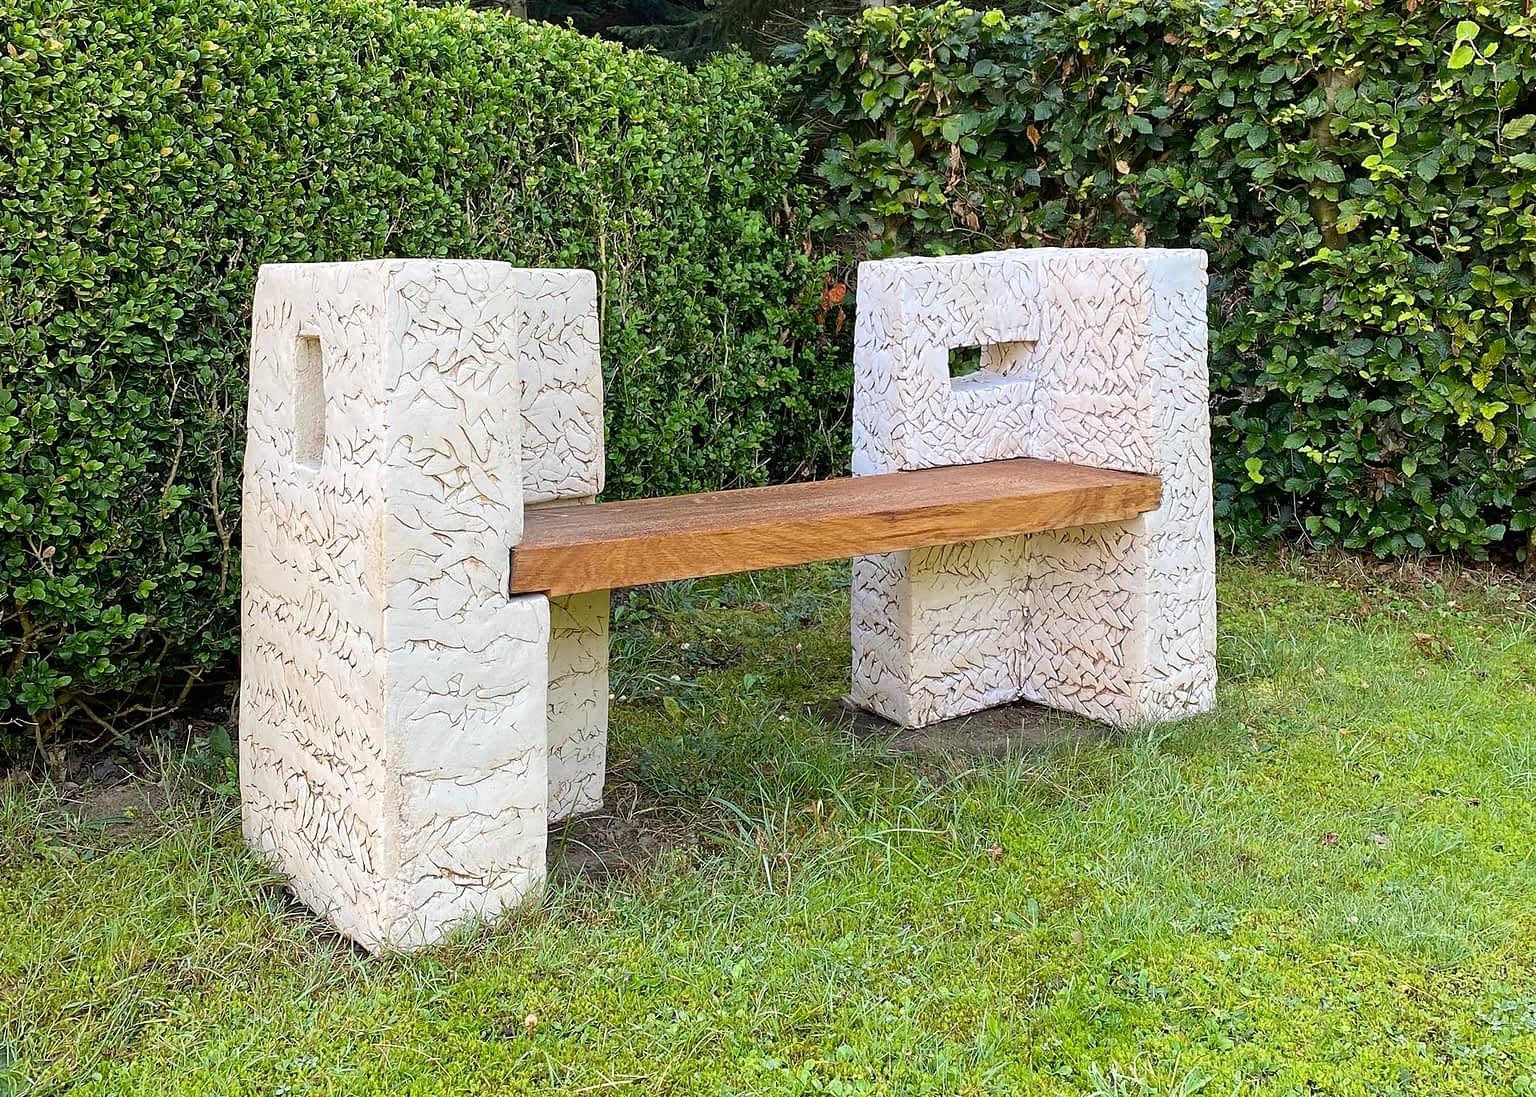 Clay-bench-sculpture-engholm-michelsen-stentoejsler